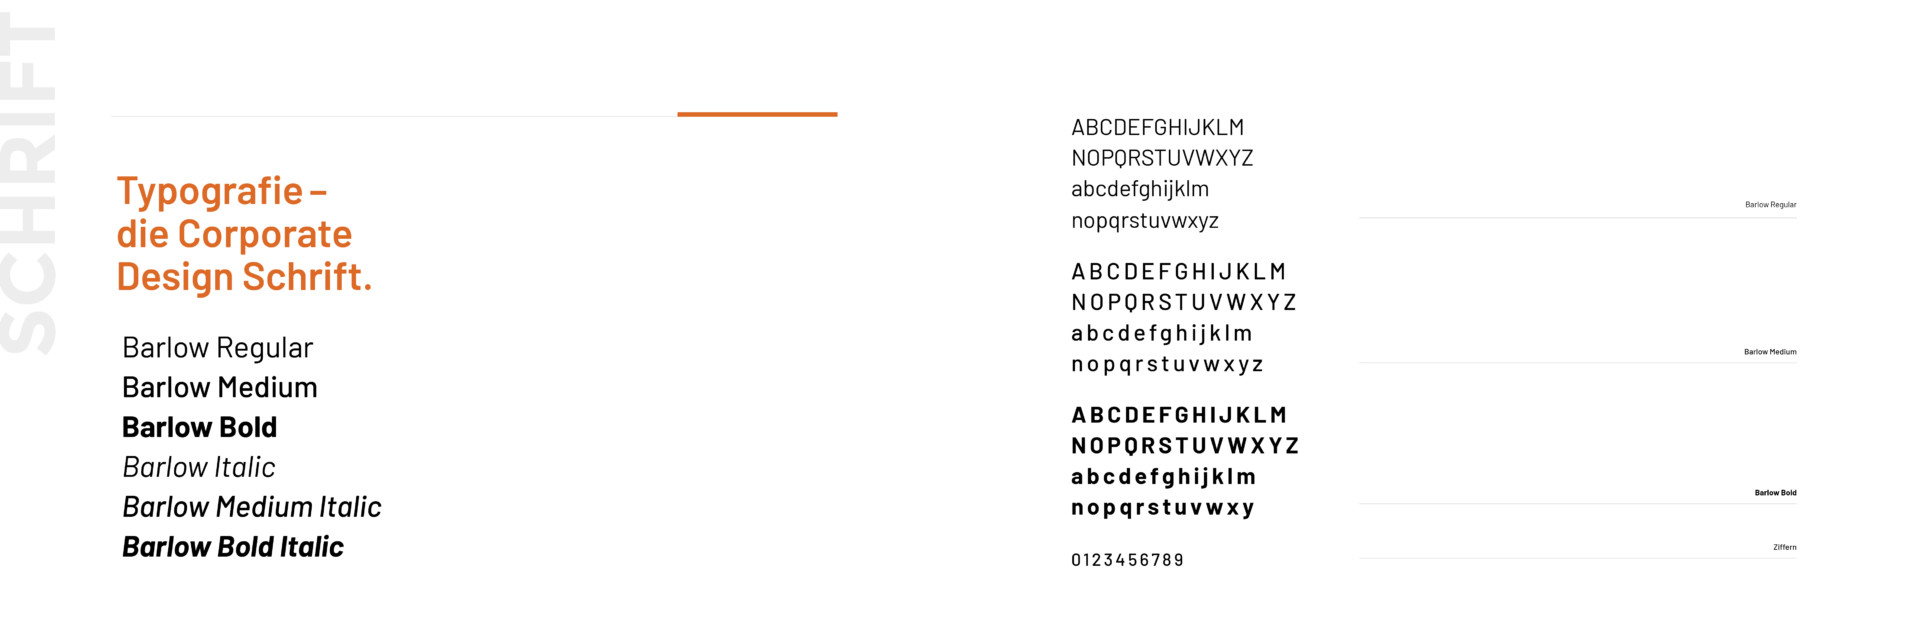 schrift-corporate-betonbautechnik-b2-werbeagentur